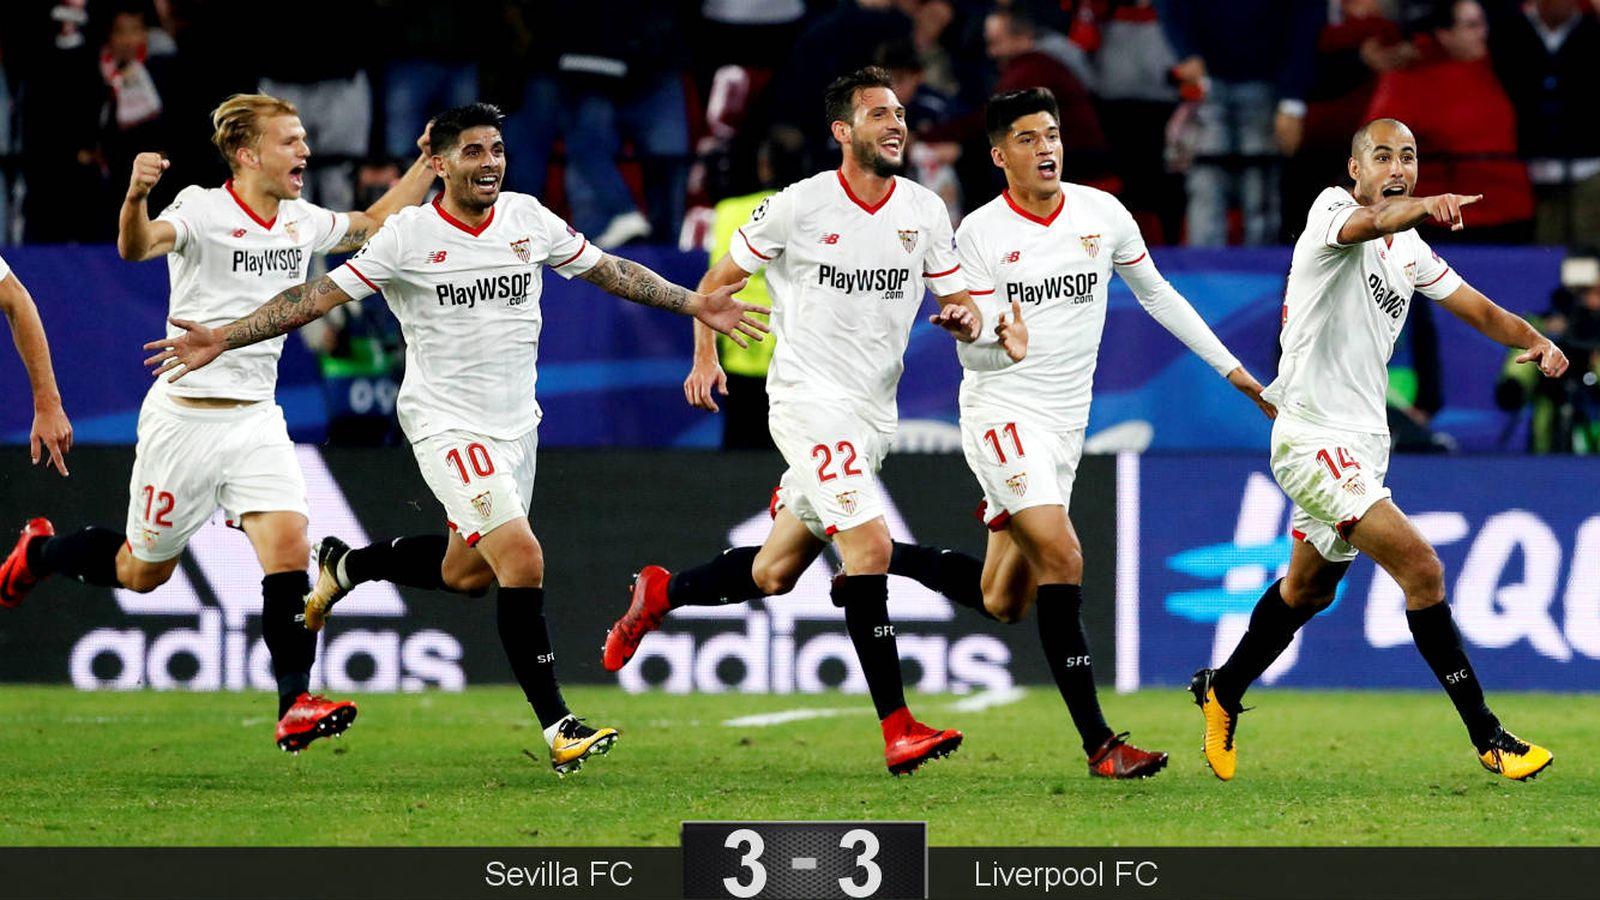 Foto: Jugadores del Sevilla celebran el gol de Pizarro que supuso el empate. (Reuters)